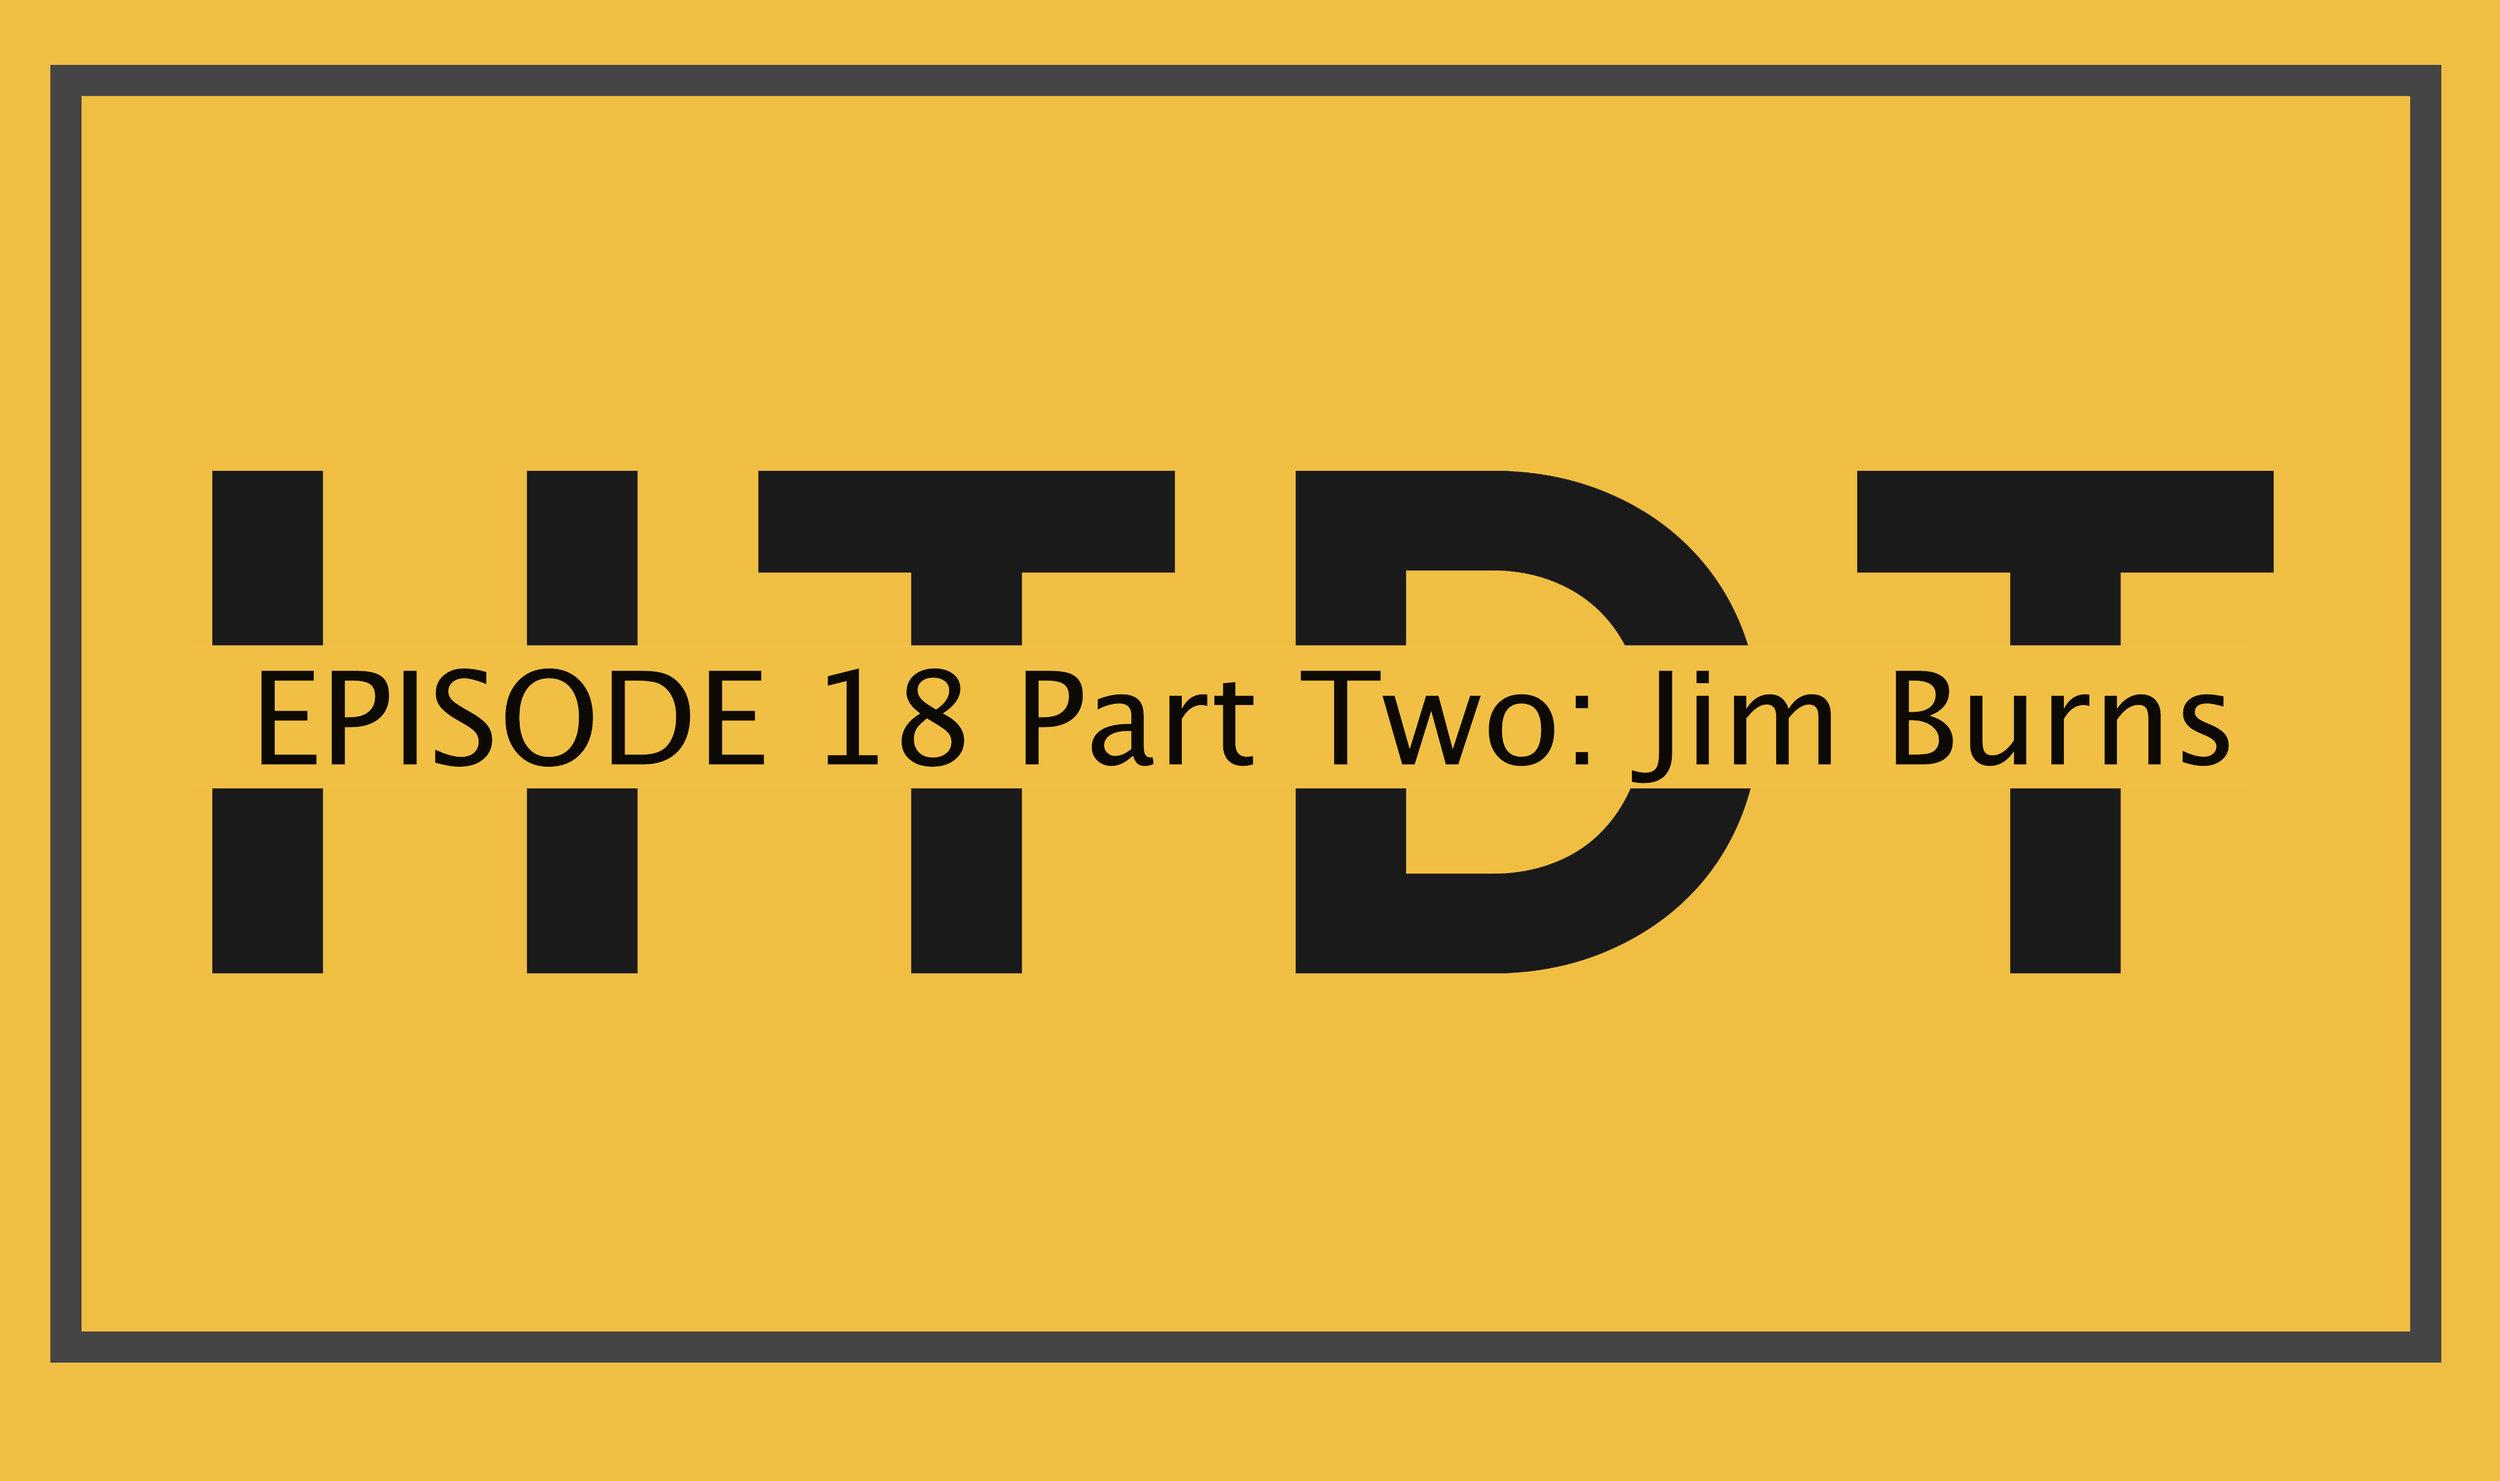 HTDT Podcast Graphic Jim Burns PT2 Header.jpg